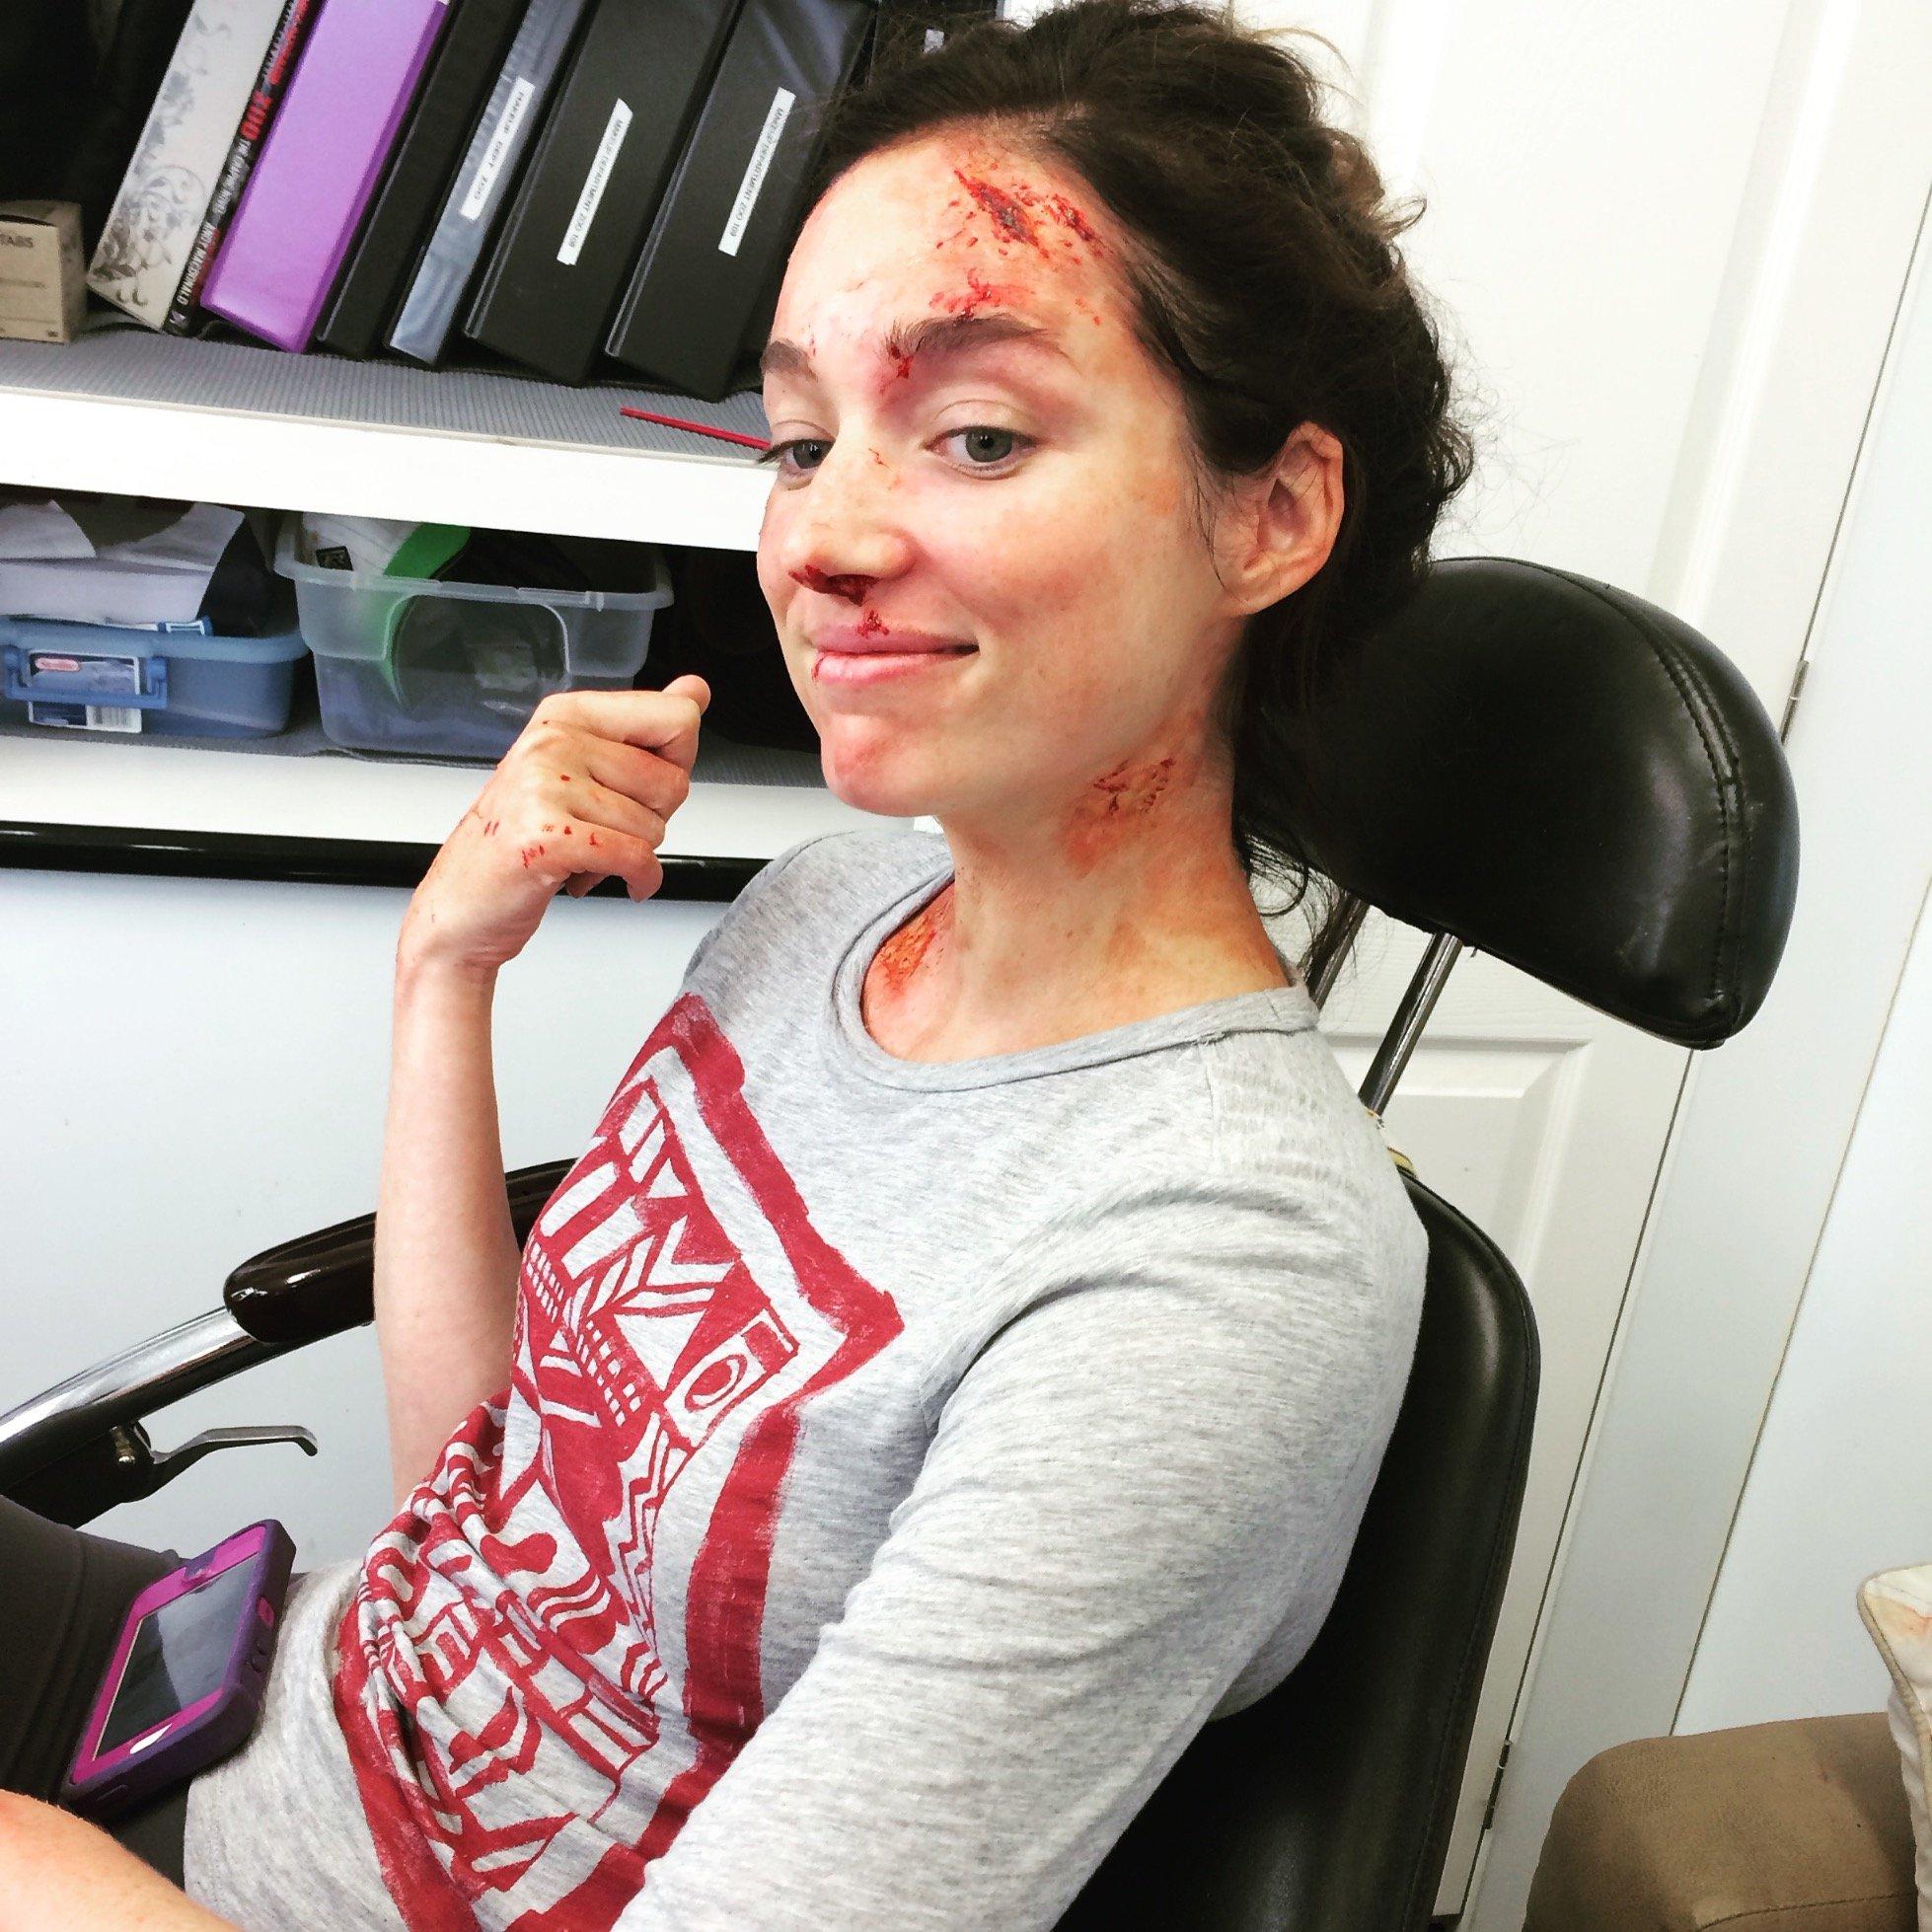 Kristen Connolly Kristen Connolly new picture